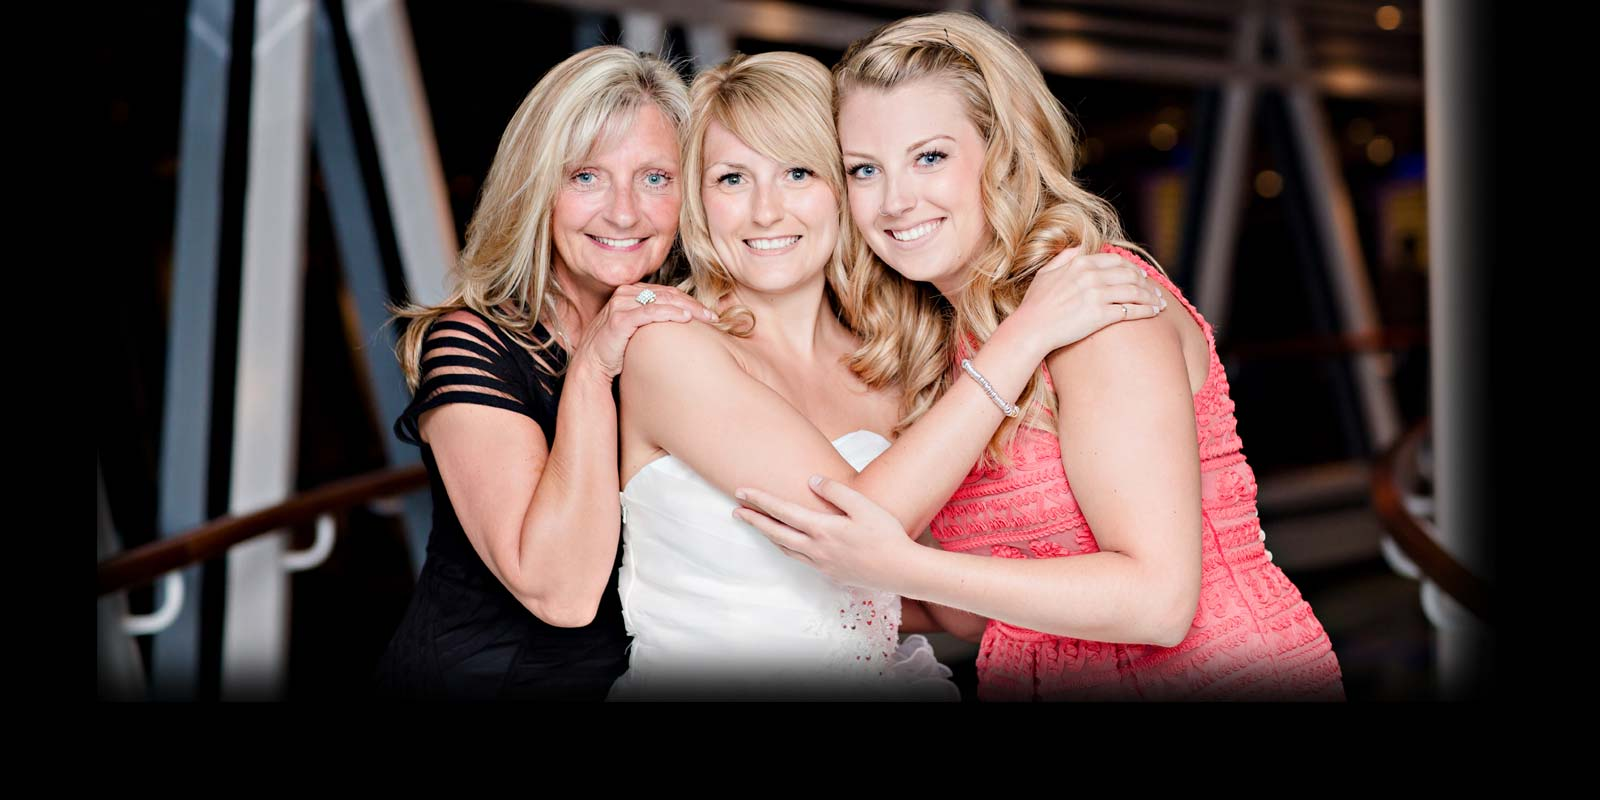 Alberta Cancer Foundation - Lung Cancer Screening